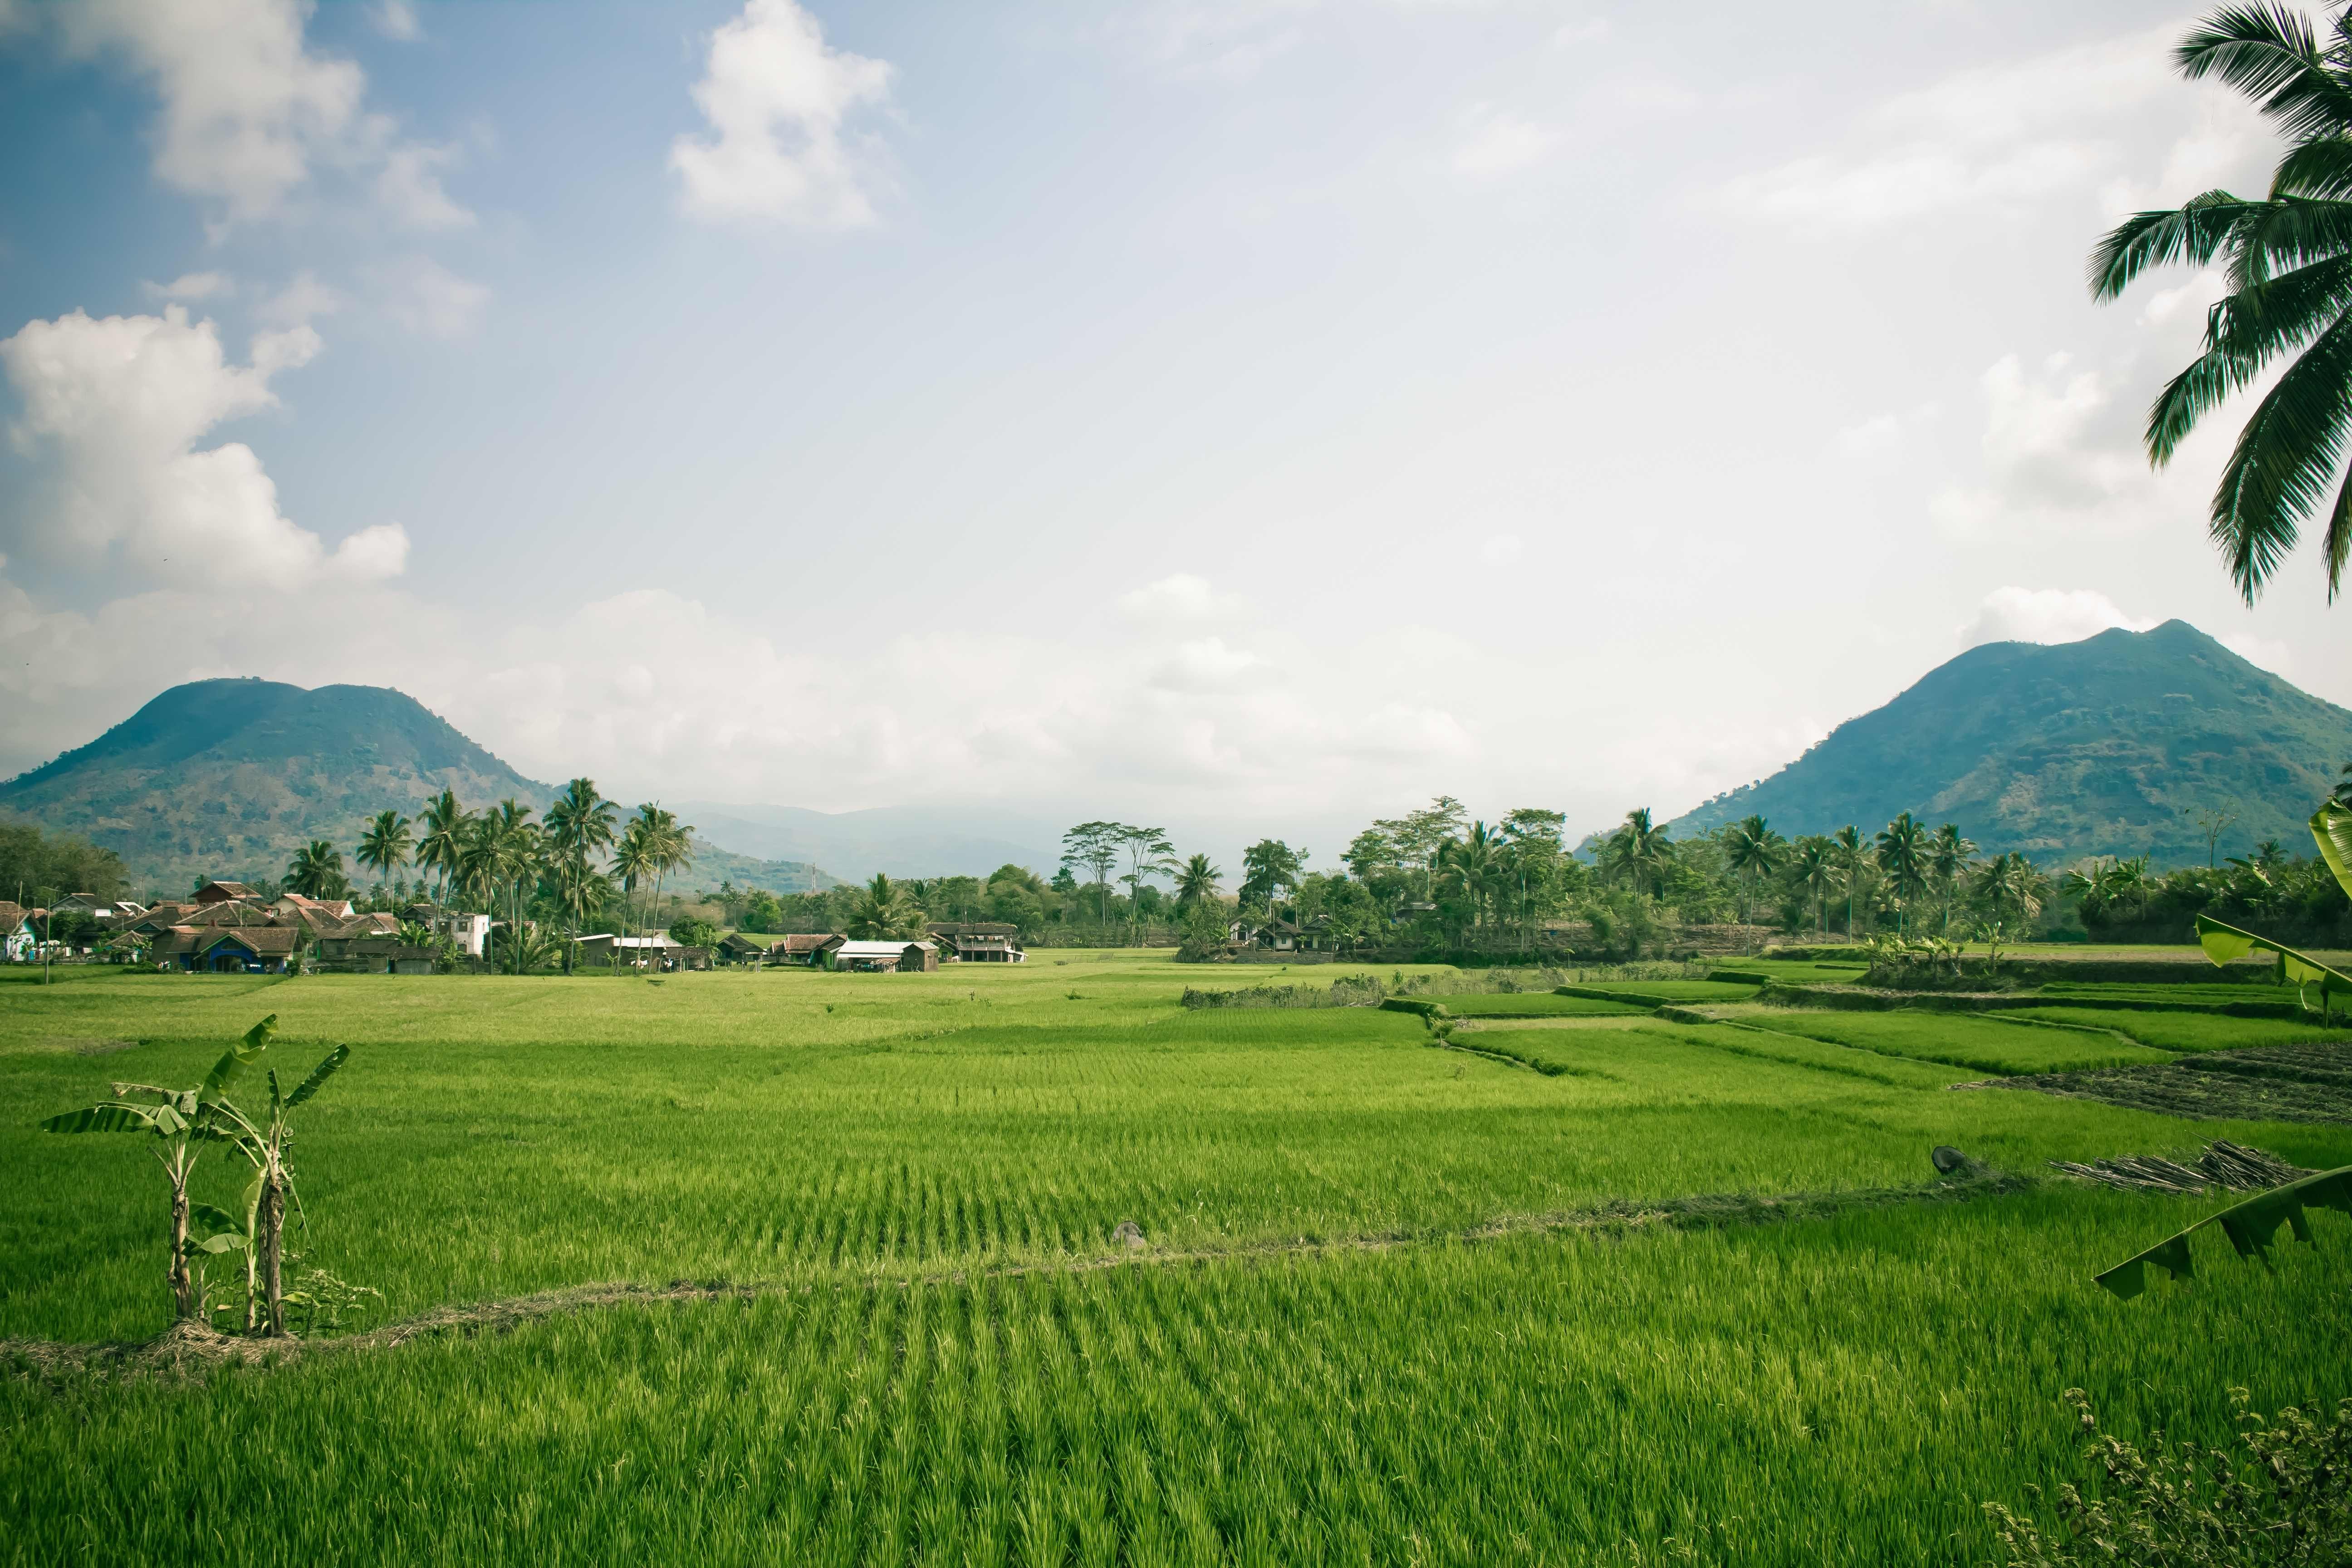 Nyasar Nyasaran Di Gagarutan Indonesia Pemandangan Tanah